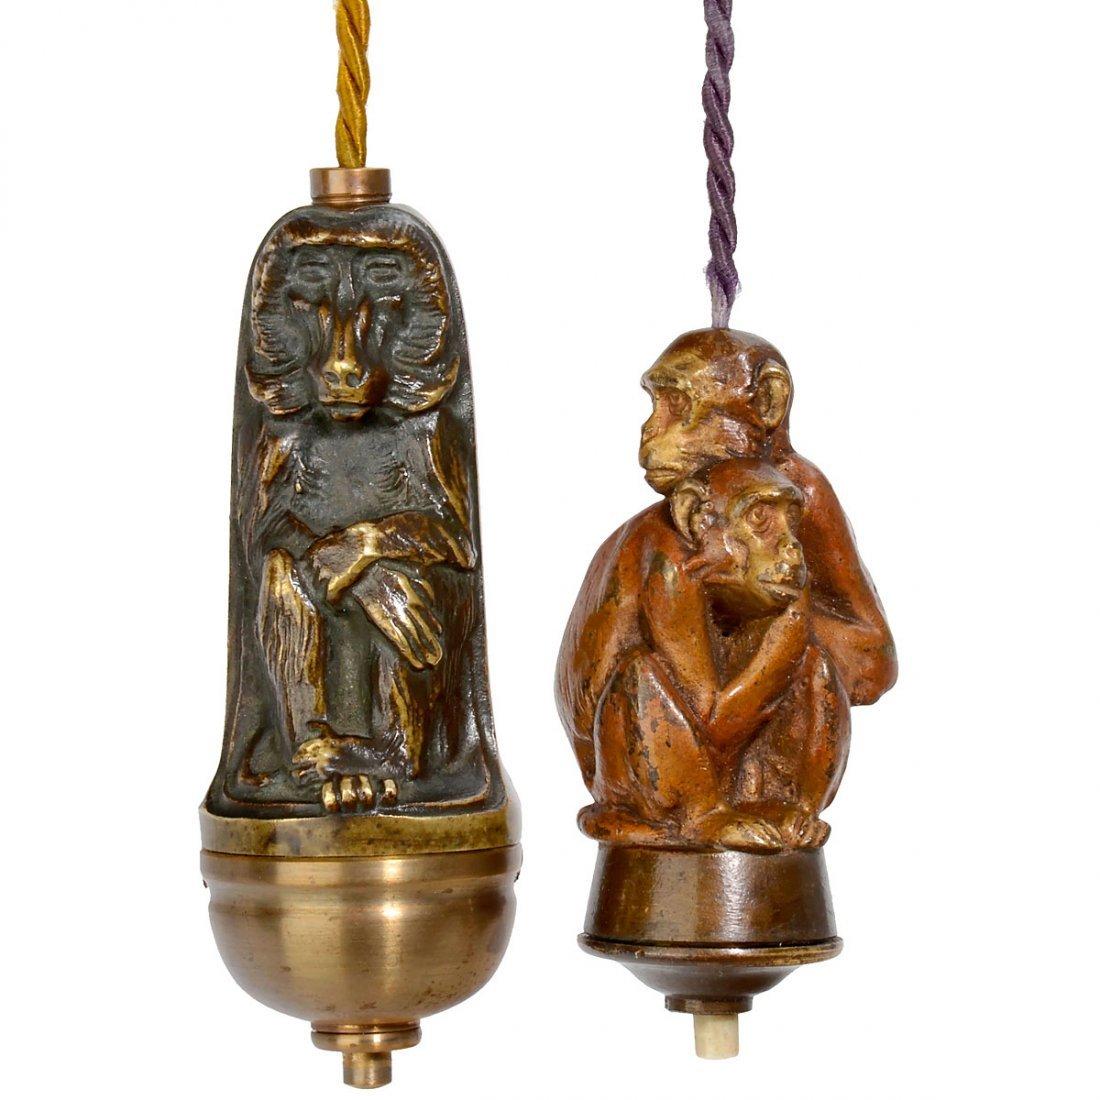 5 Electrical Table Bells Depicting Monkeys, c. 1910 - 2